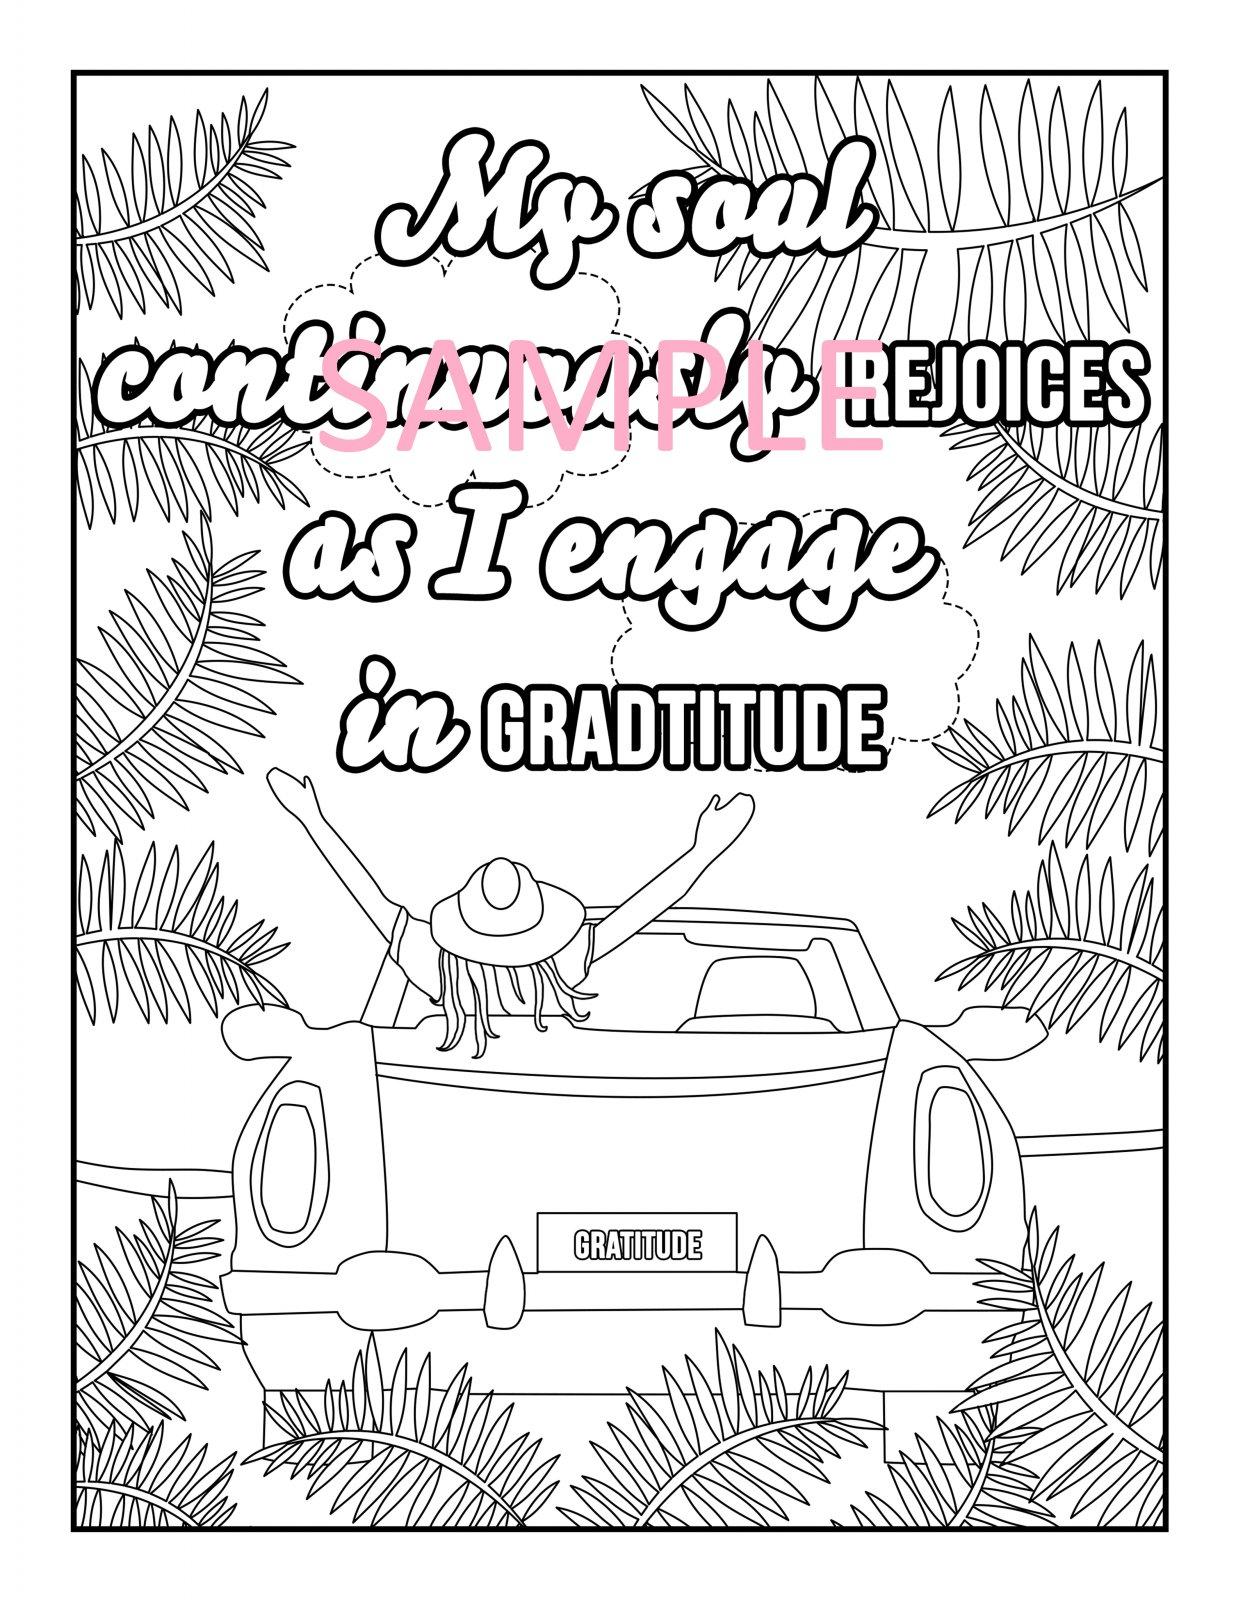 Gratitude Coloring Page 1